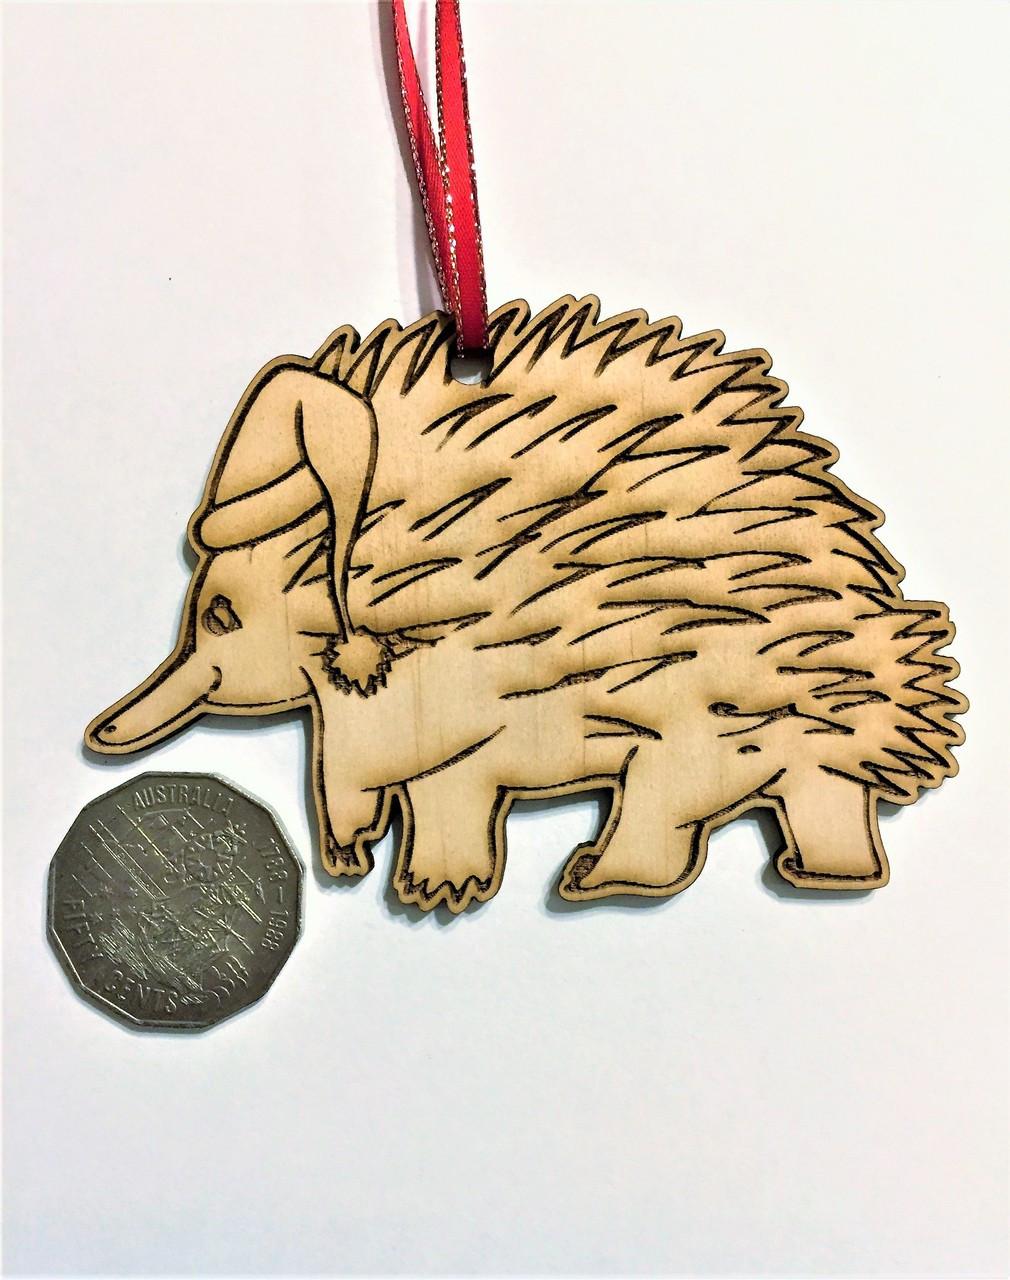 D-Echidna - Wooden Christmas Tree Ornament